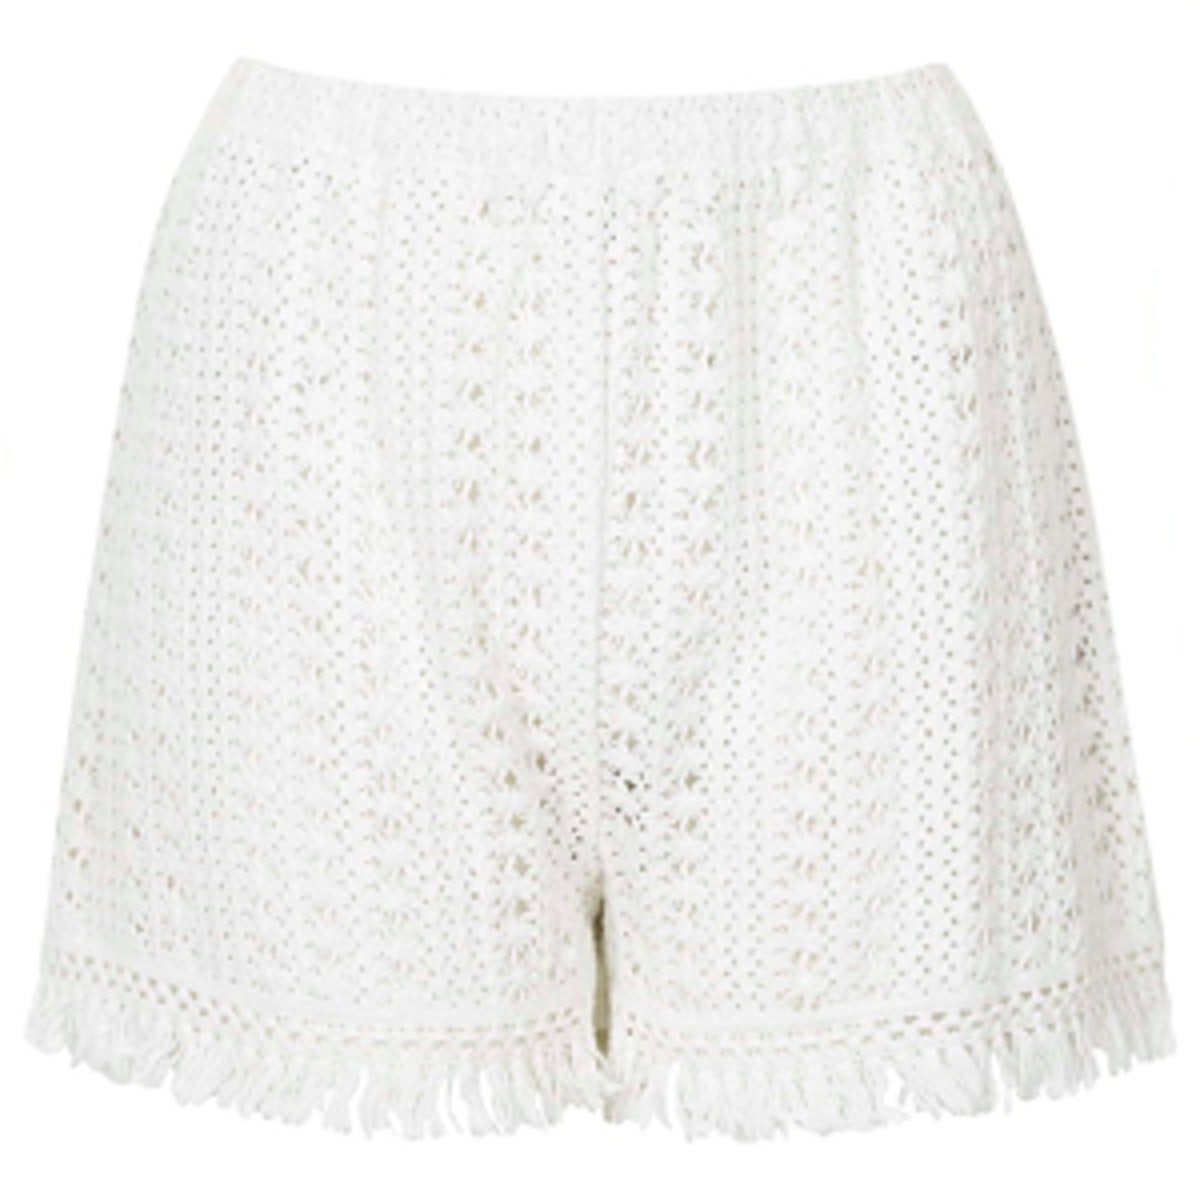 Fringe Trim Crochet Shorts